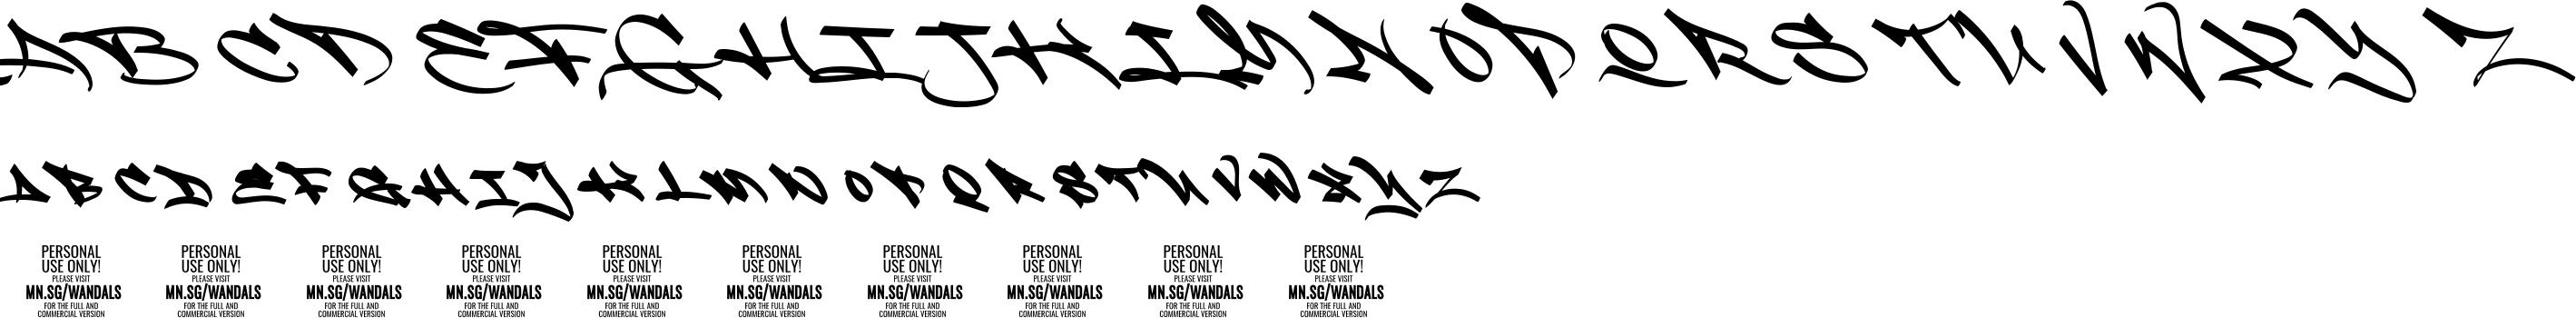 Fatwandalsalt Personal Character Map Image